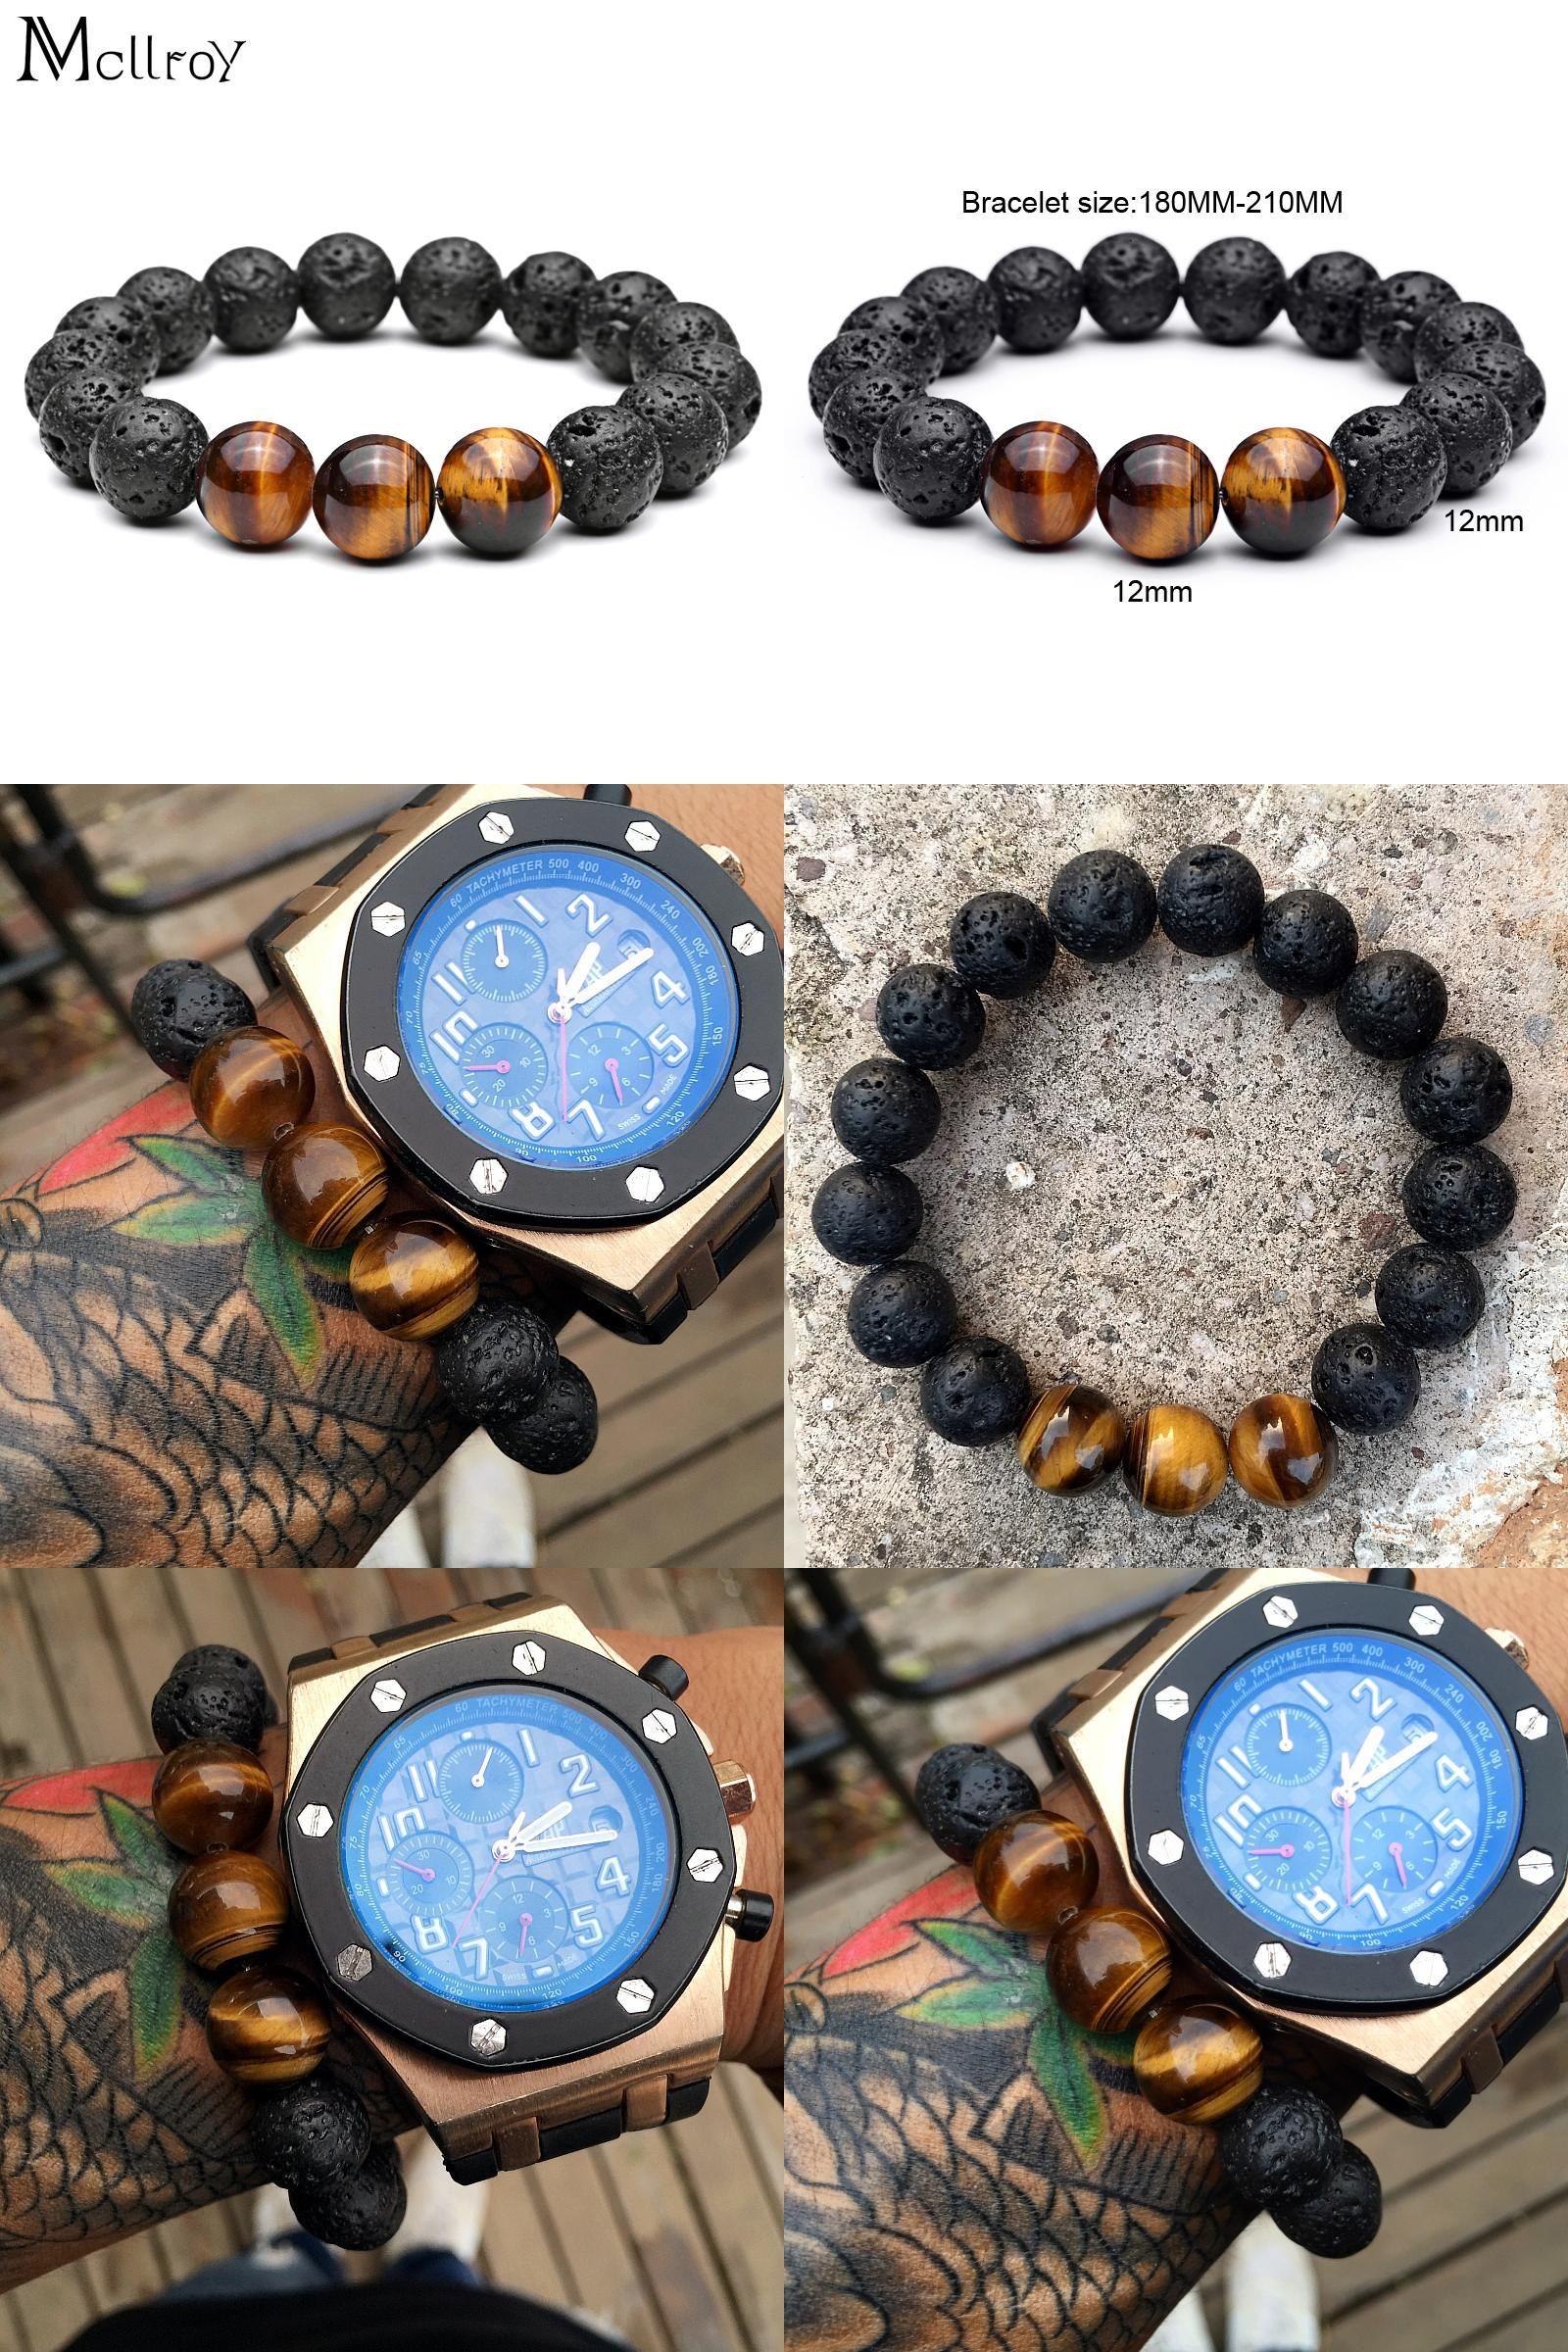 Visit to buy mcllroy diy trendy bracelets for men black lave stone